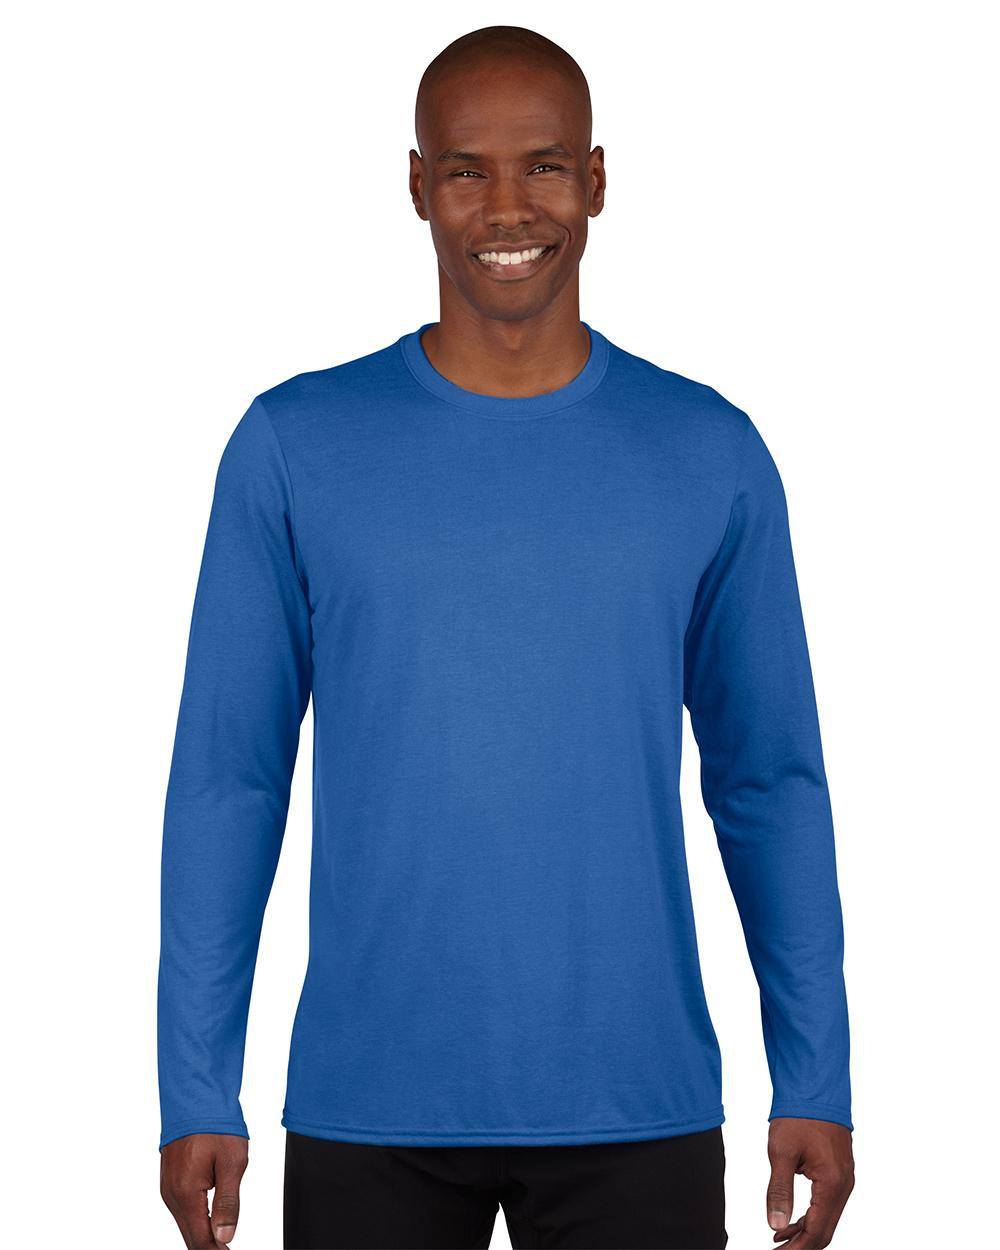 Gildan 42400     Adult Long Sleeve Performance    4.5 oz. 100% Polyester (Cotton Feel)